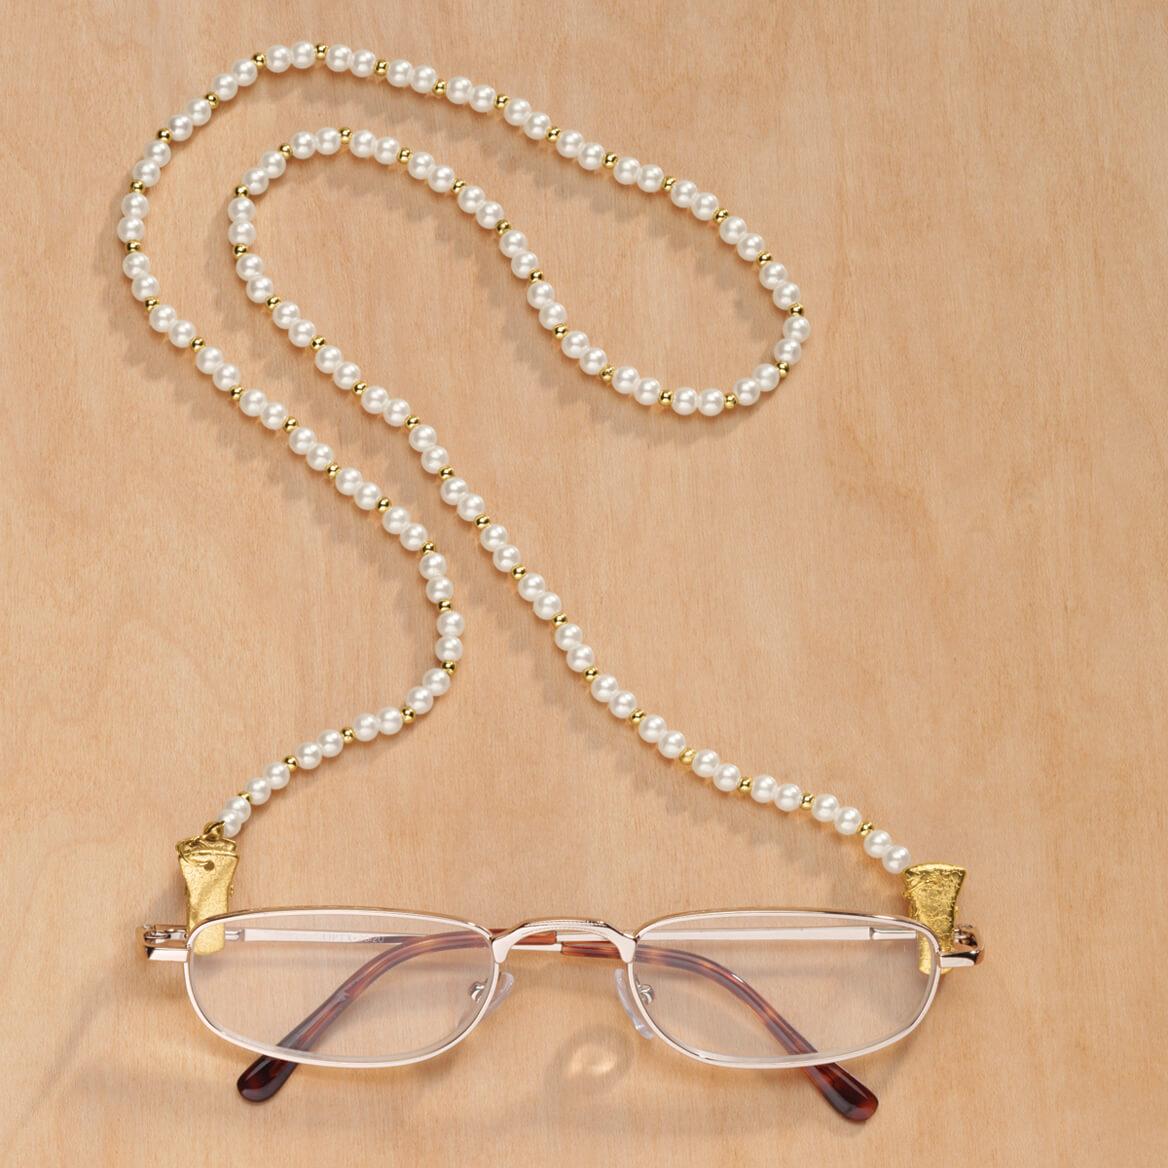 Eyeglass Chain-337766